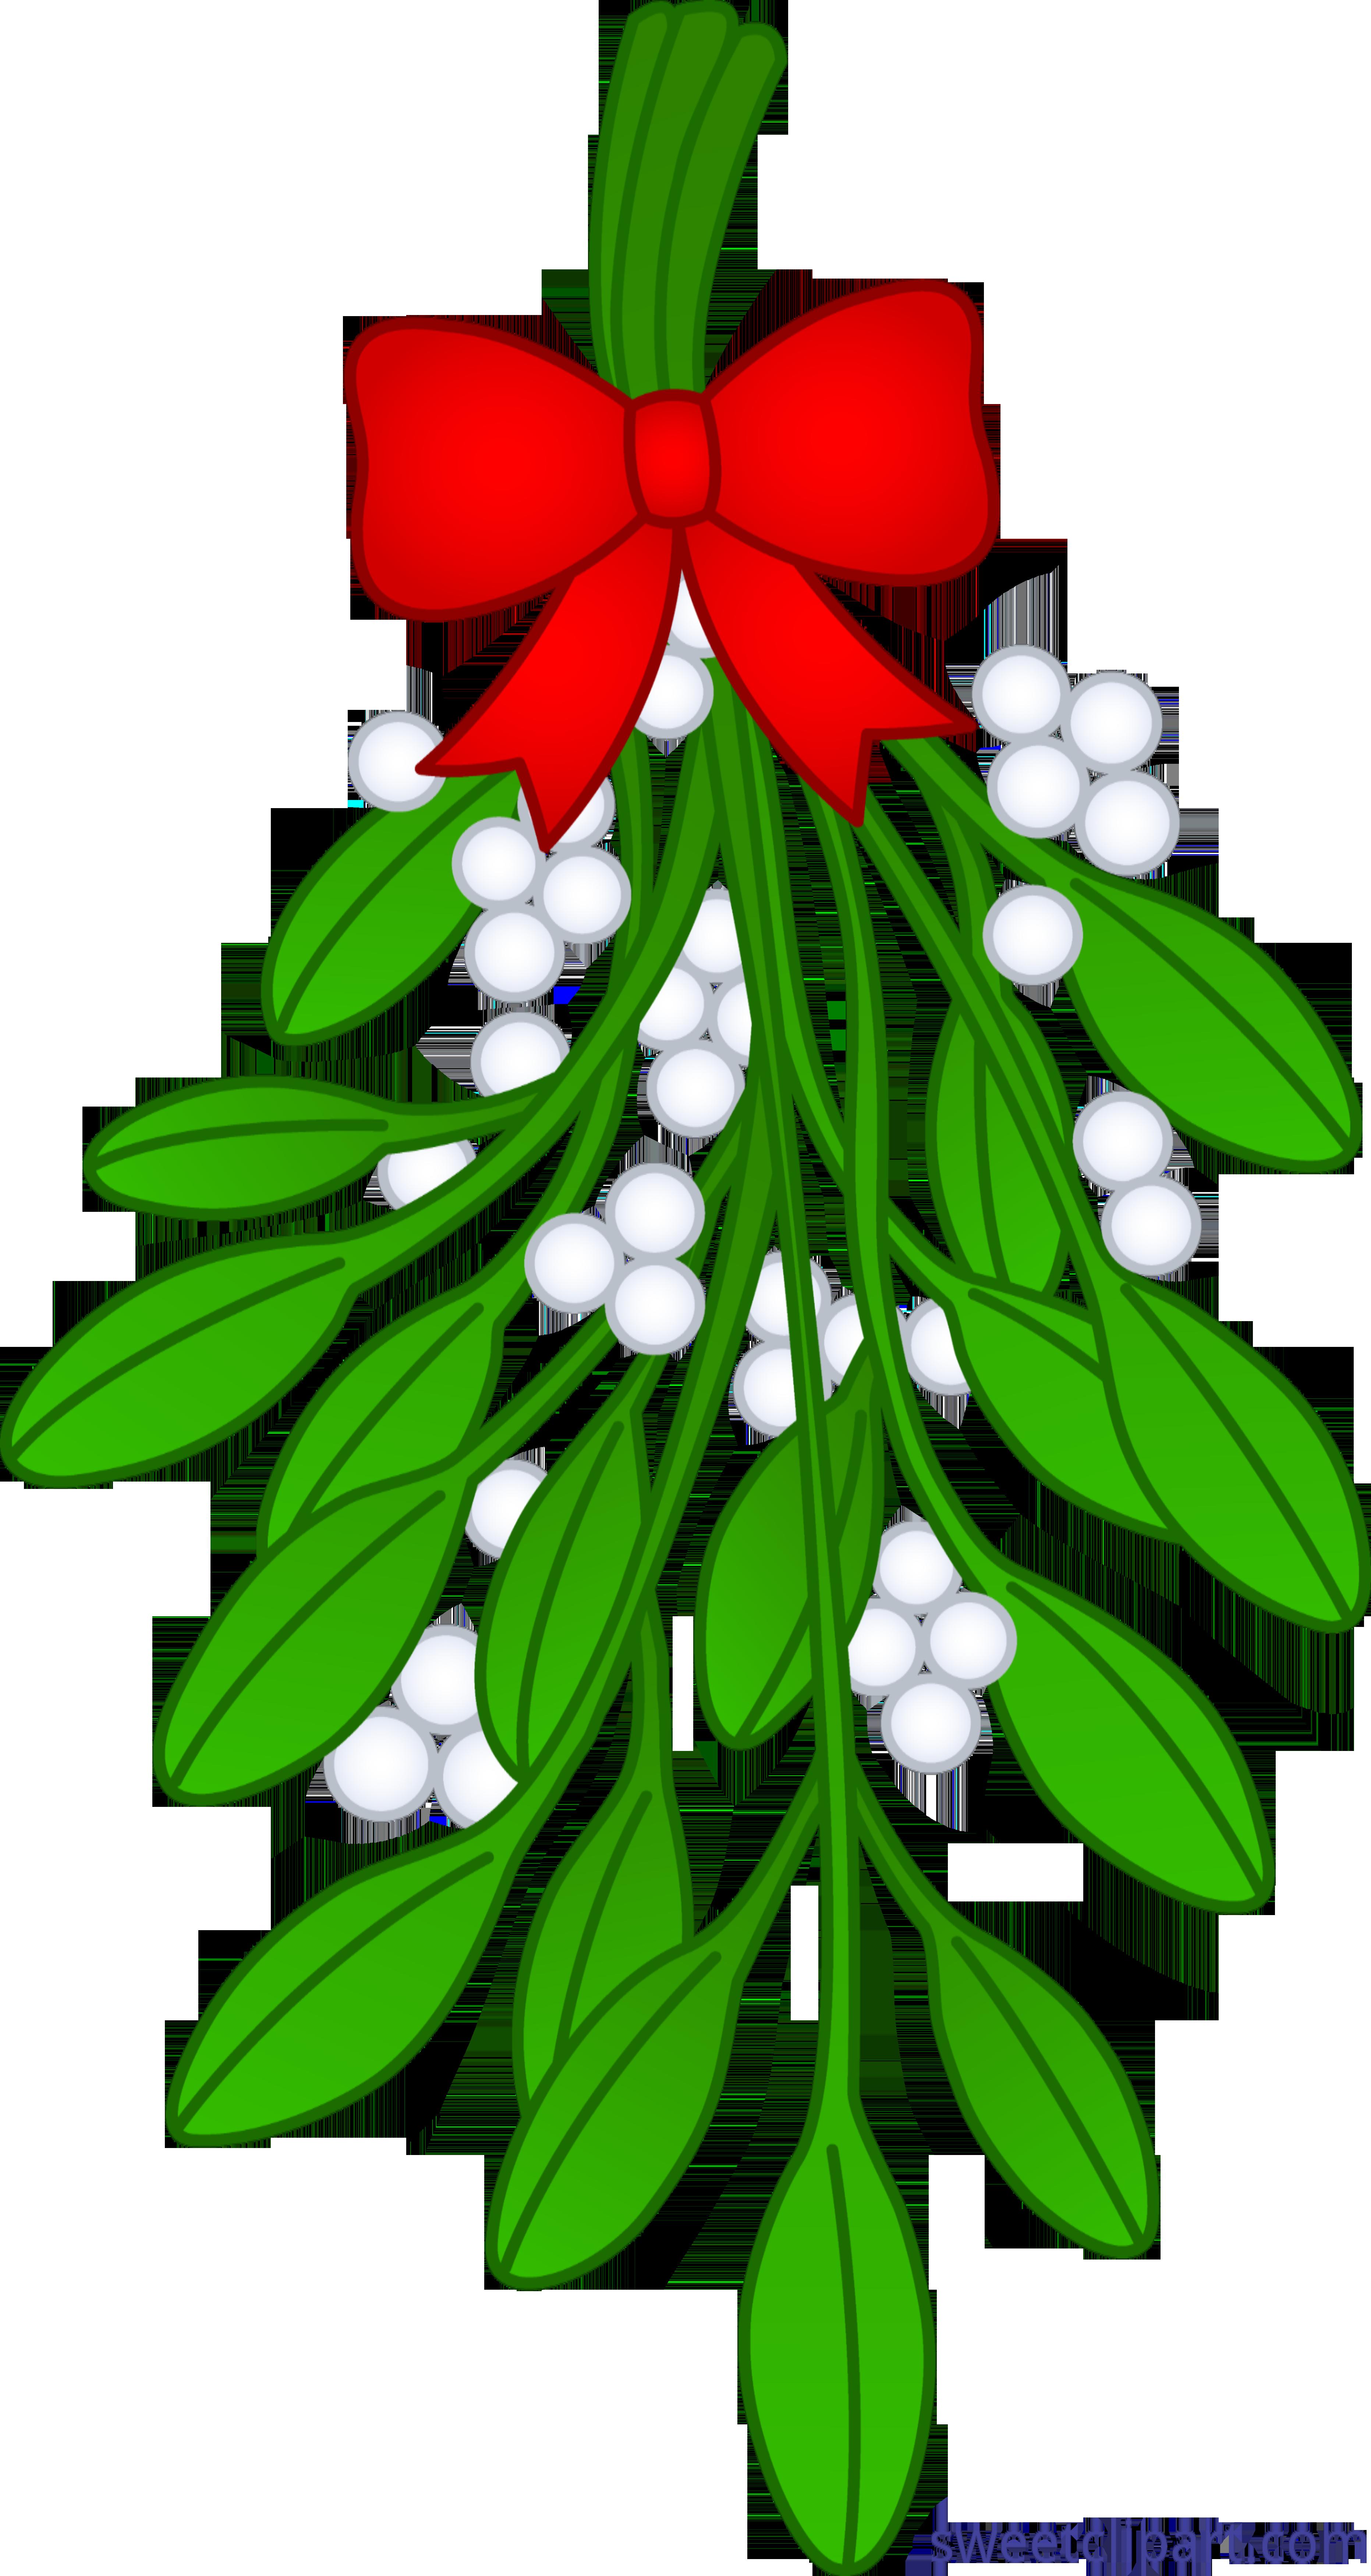 Christmas mistletoe clipart graphic library library Christmas Mistletoe With Ribbon Clip Art - Sweet Clip Art graphic library library